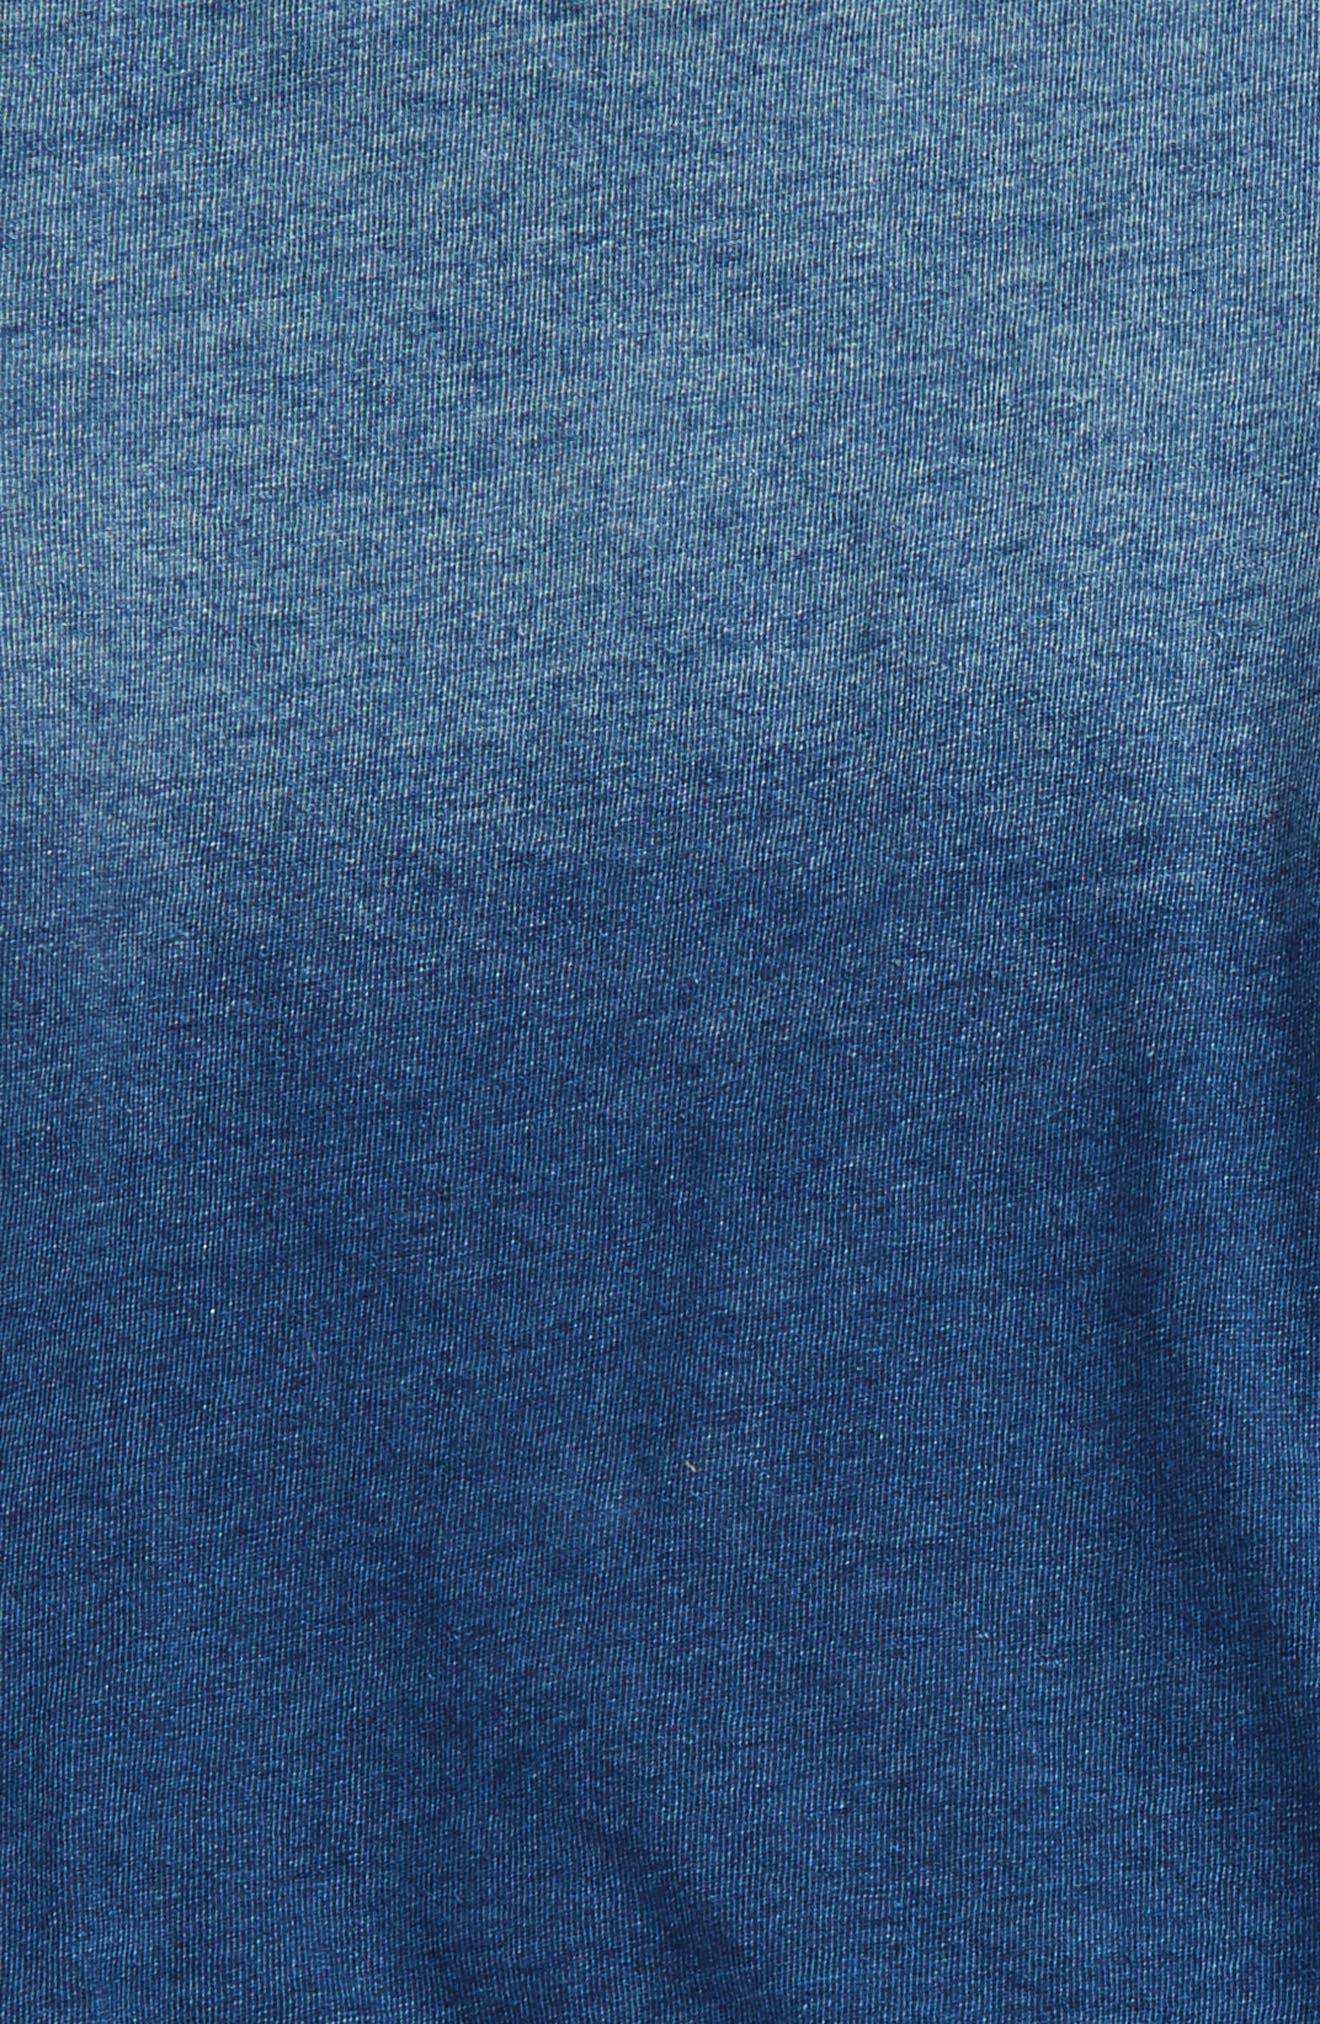 T-Shirt & Pants Set,                             Alternate thumbnail 3, color,                             400